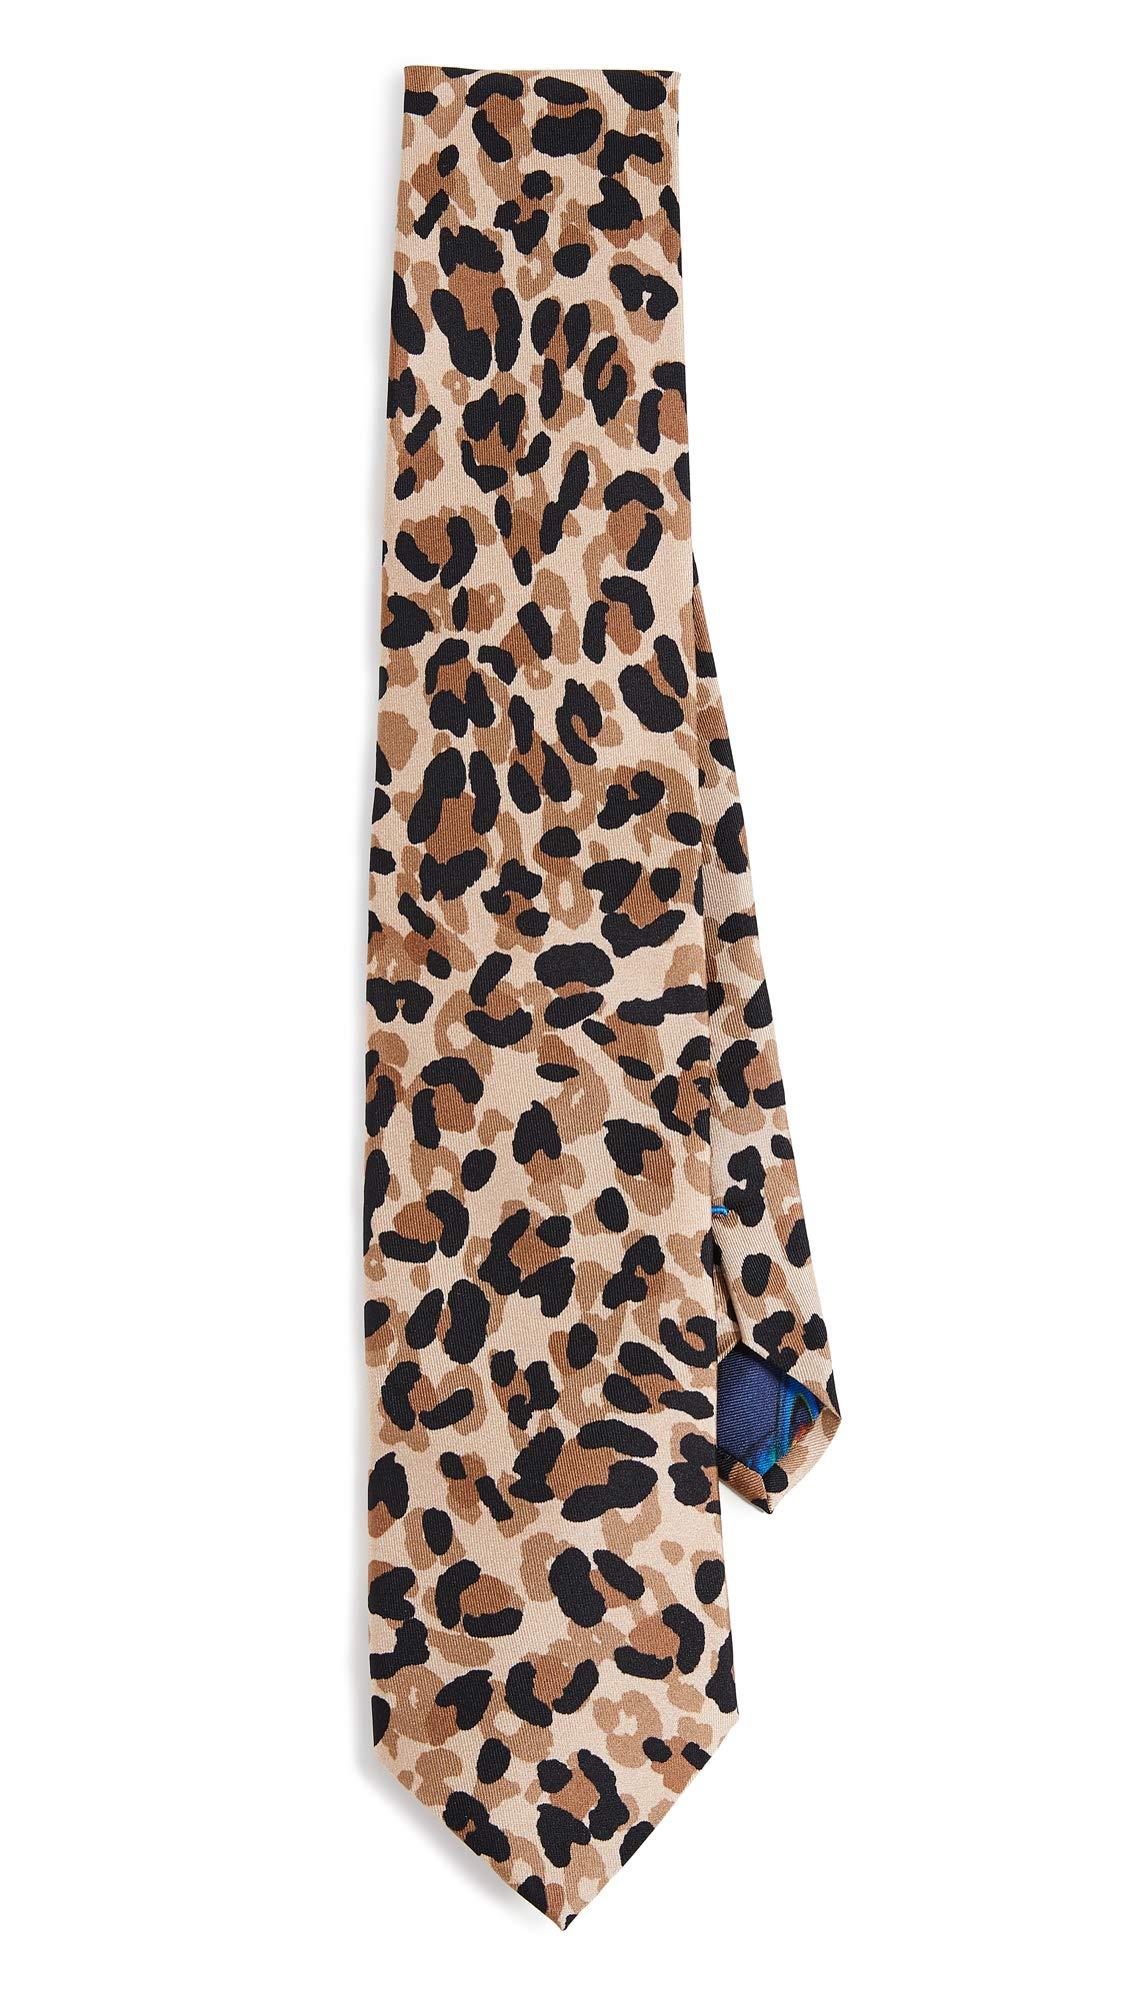 Paul Smith Men's Leopard Print Narrow Tie, Leopard, One Size